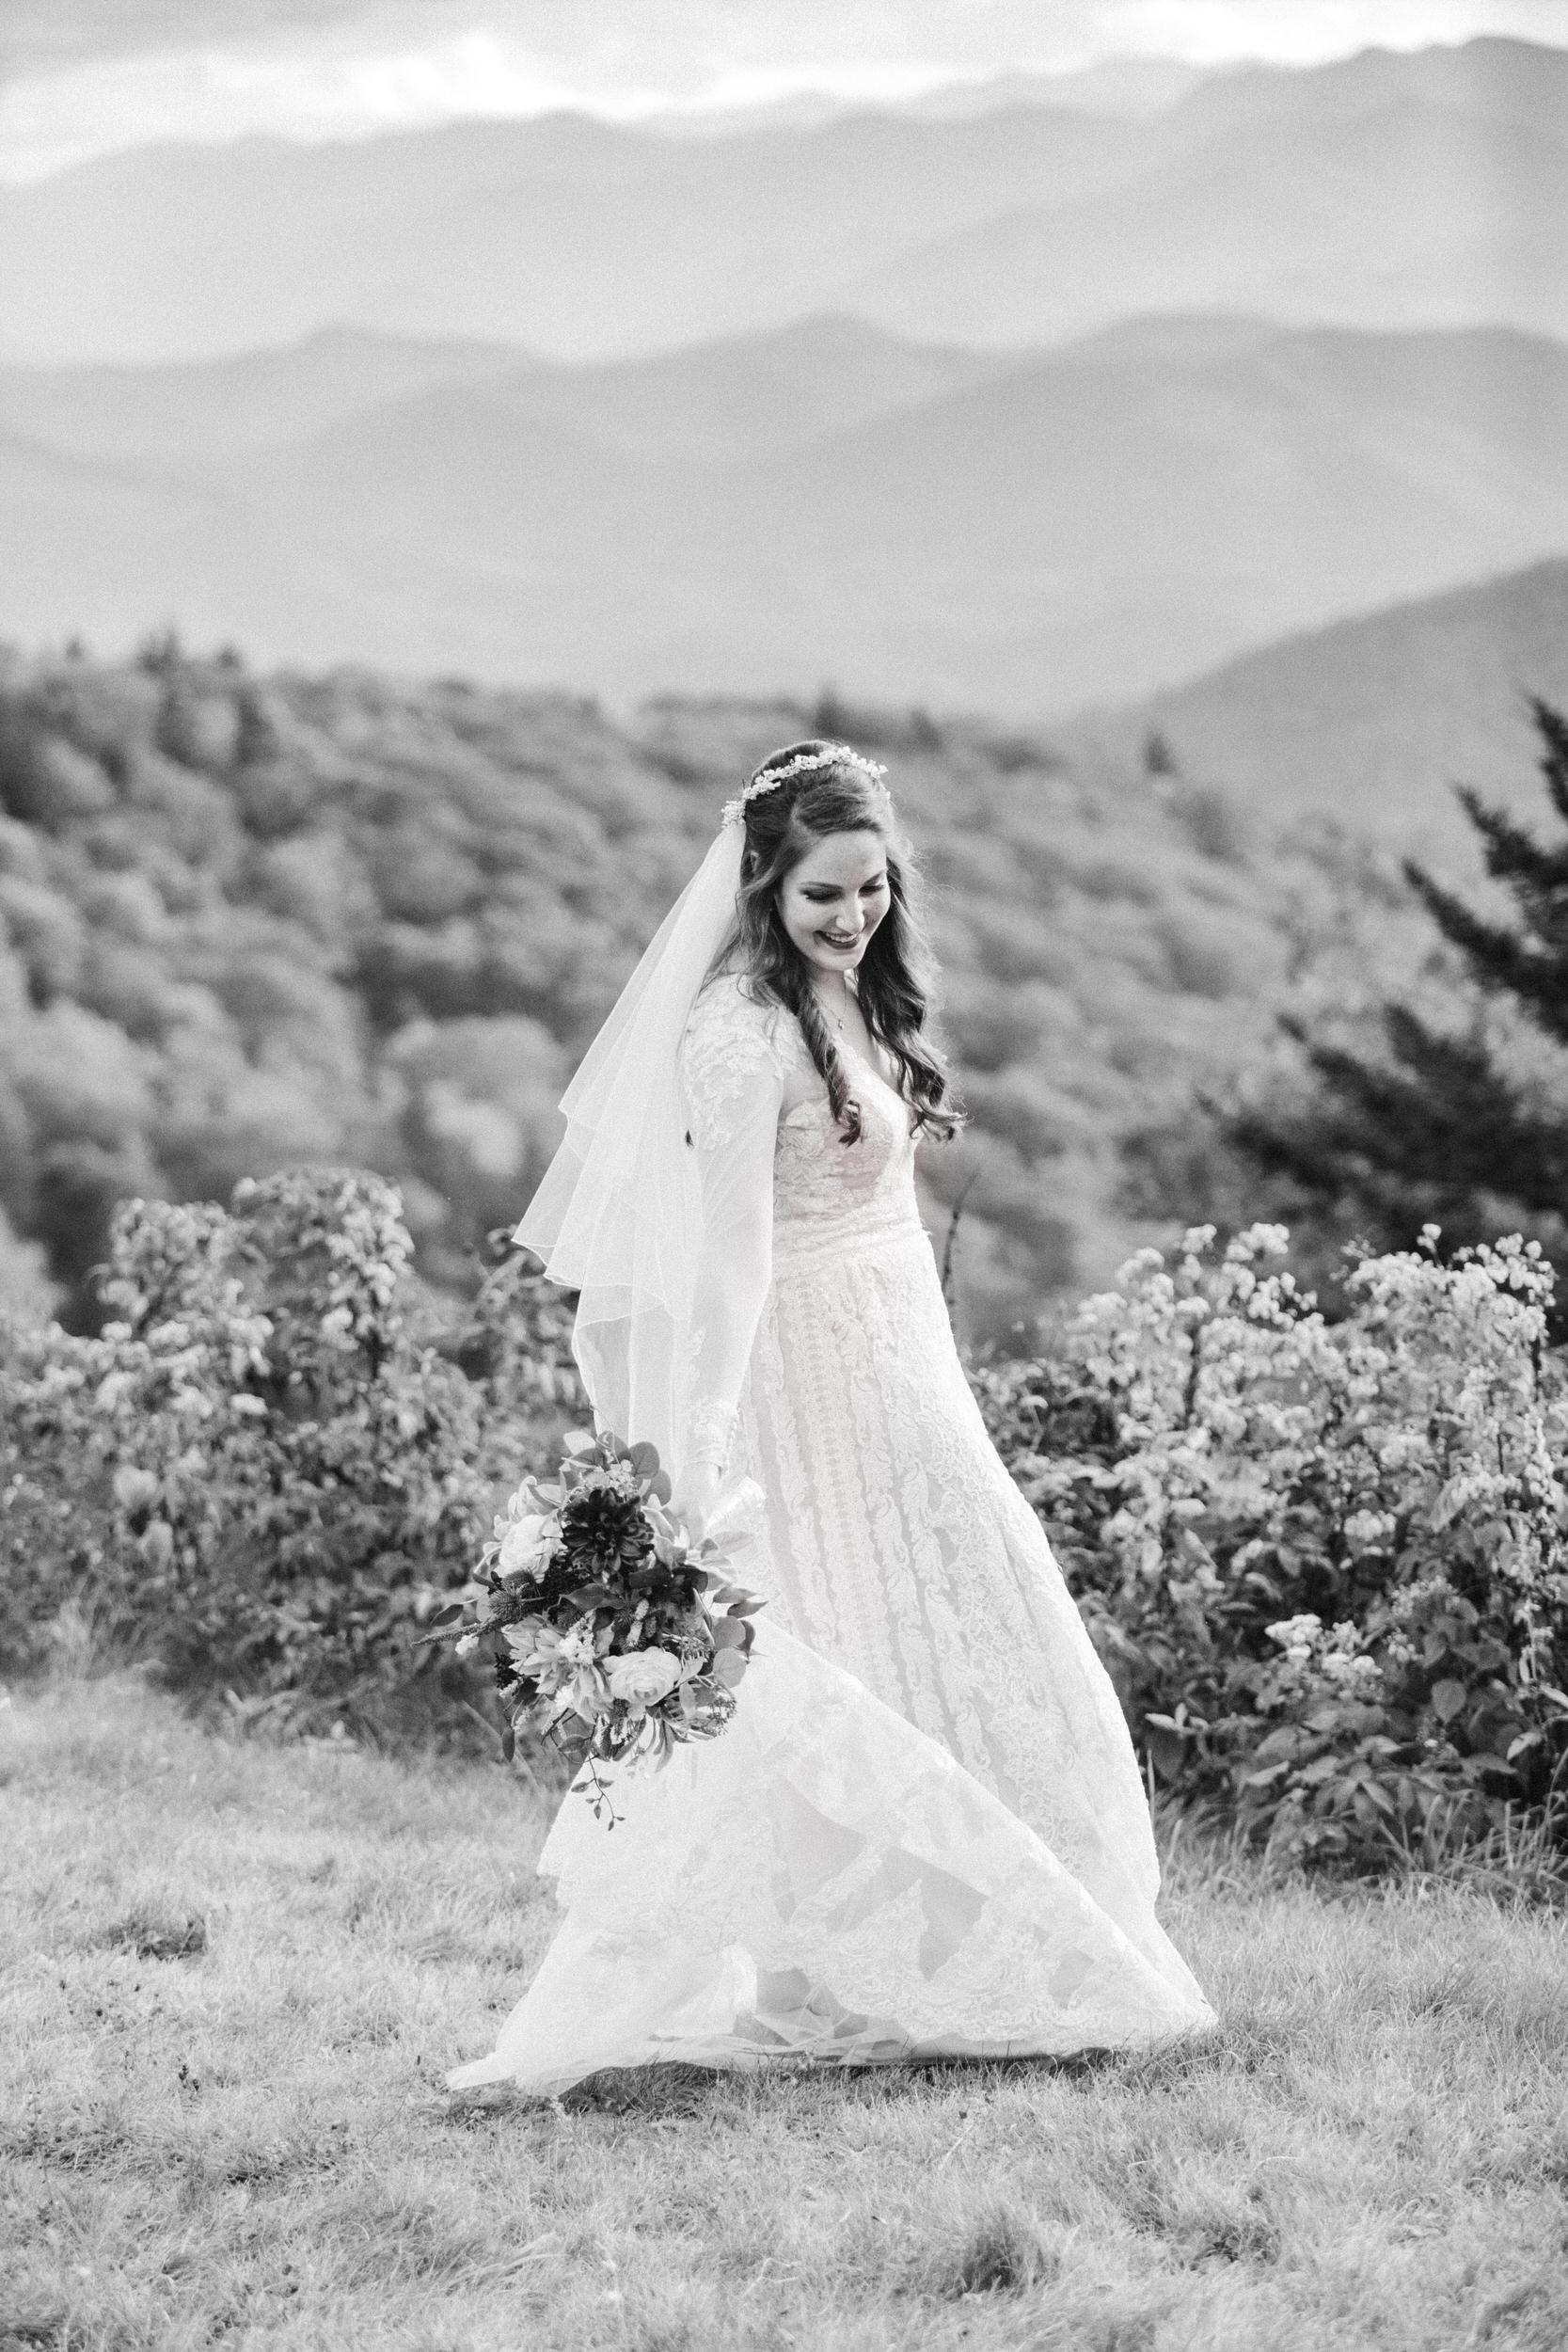 5. Mountain Bride & Groom Portraits- Cole + Rachel's Great Smoky Mountain National Park Elopement-11.jpg